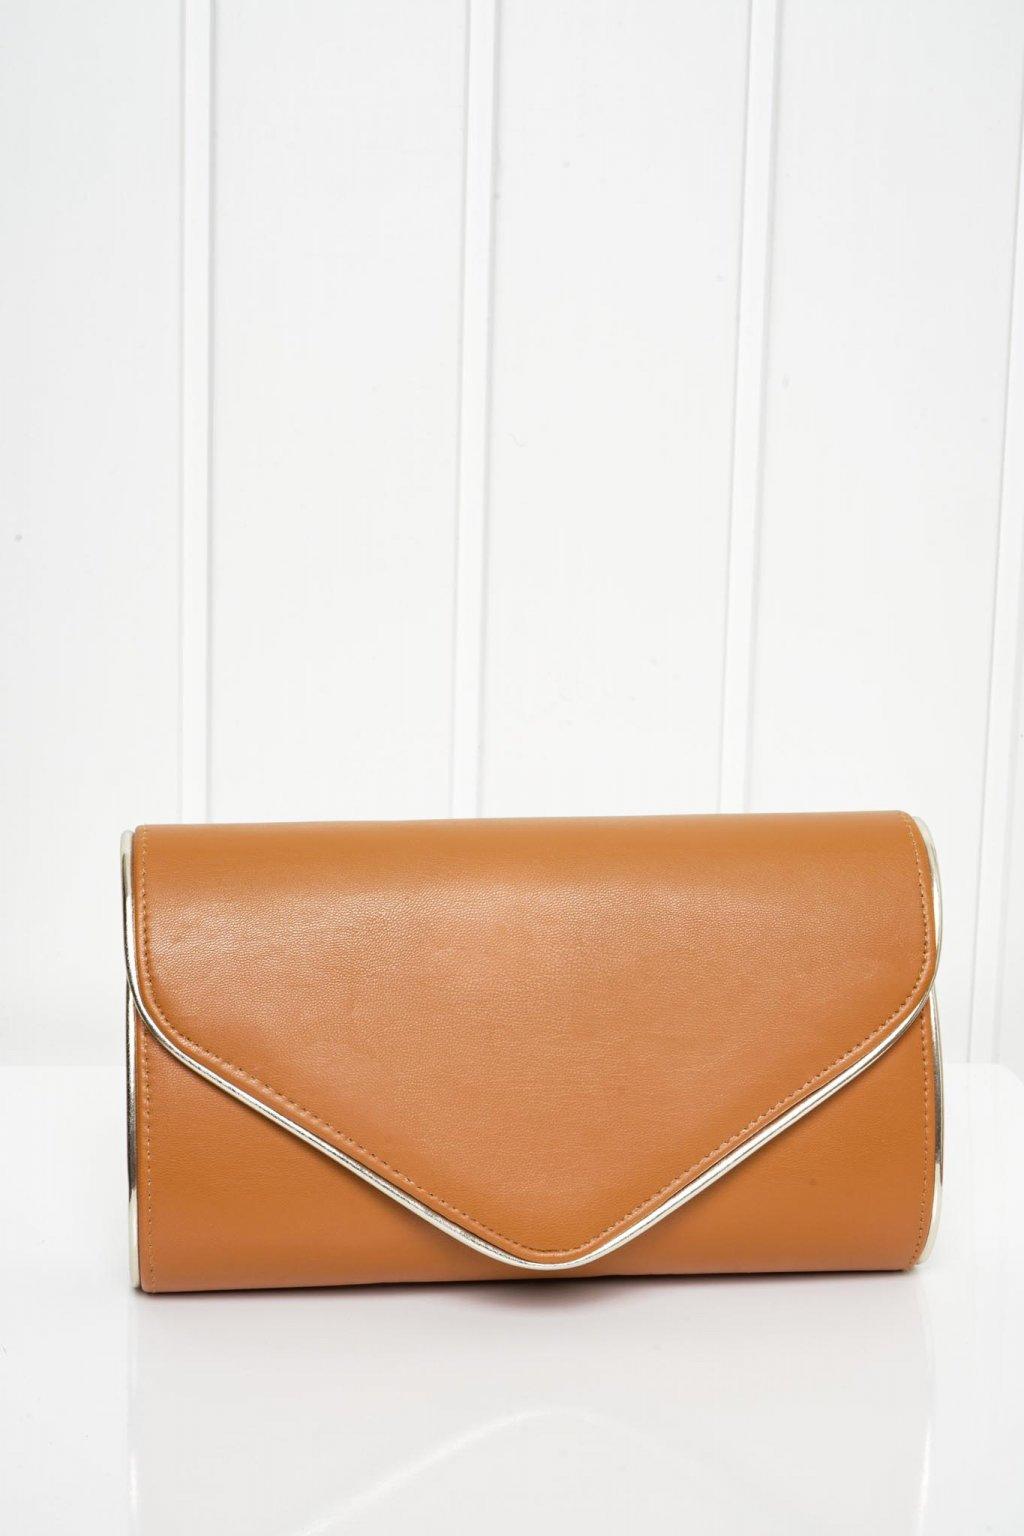 Kabelka, crossbody, ruksak, shopping bag, shopperka, 545